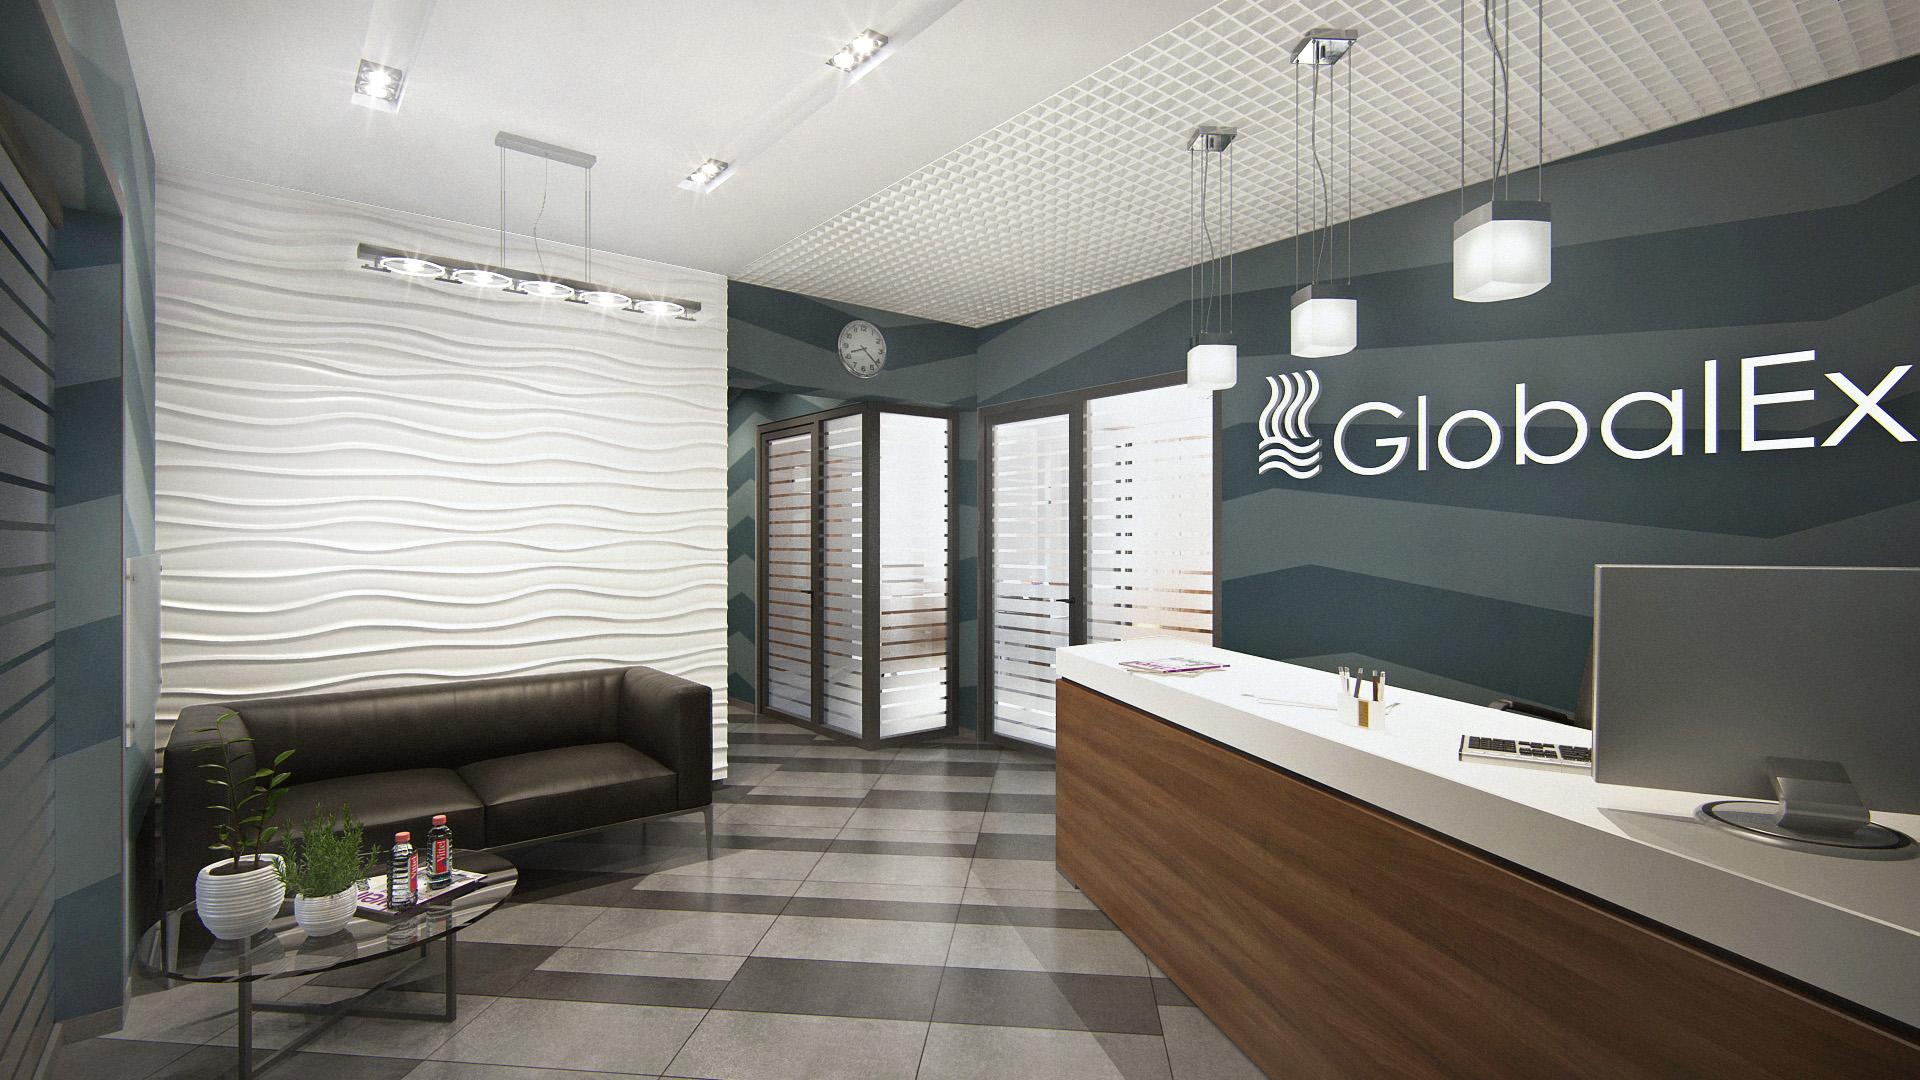 001-GlobalEx-